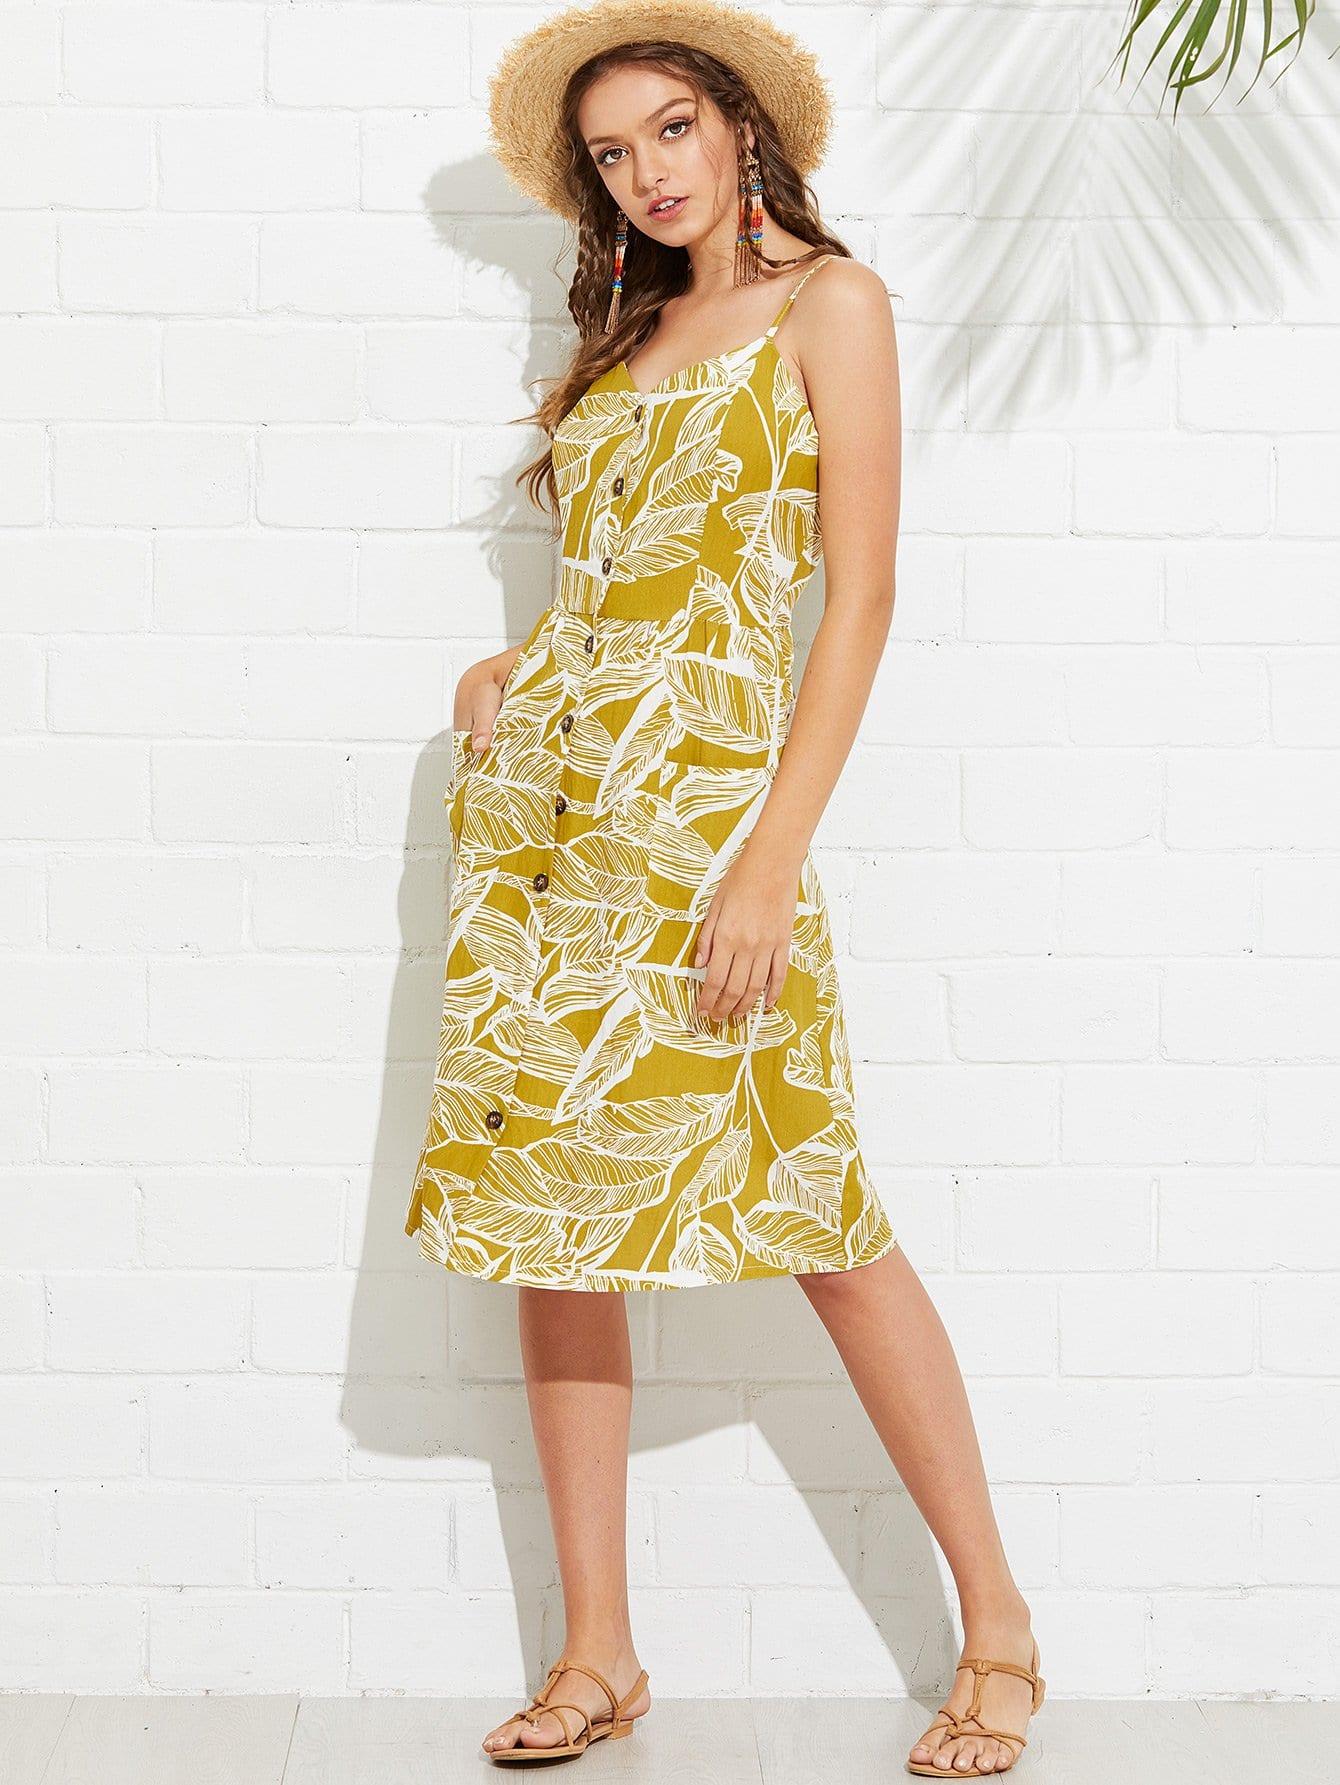 793f9ceb315 Tropical Print Button Through Cami Dress EmmaCloth-Women Fast ...